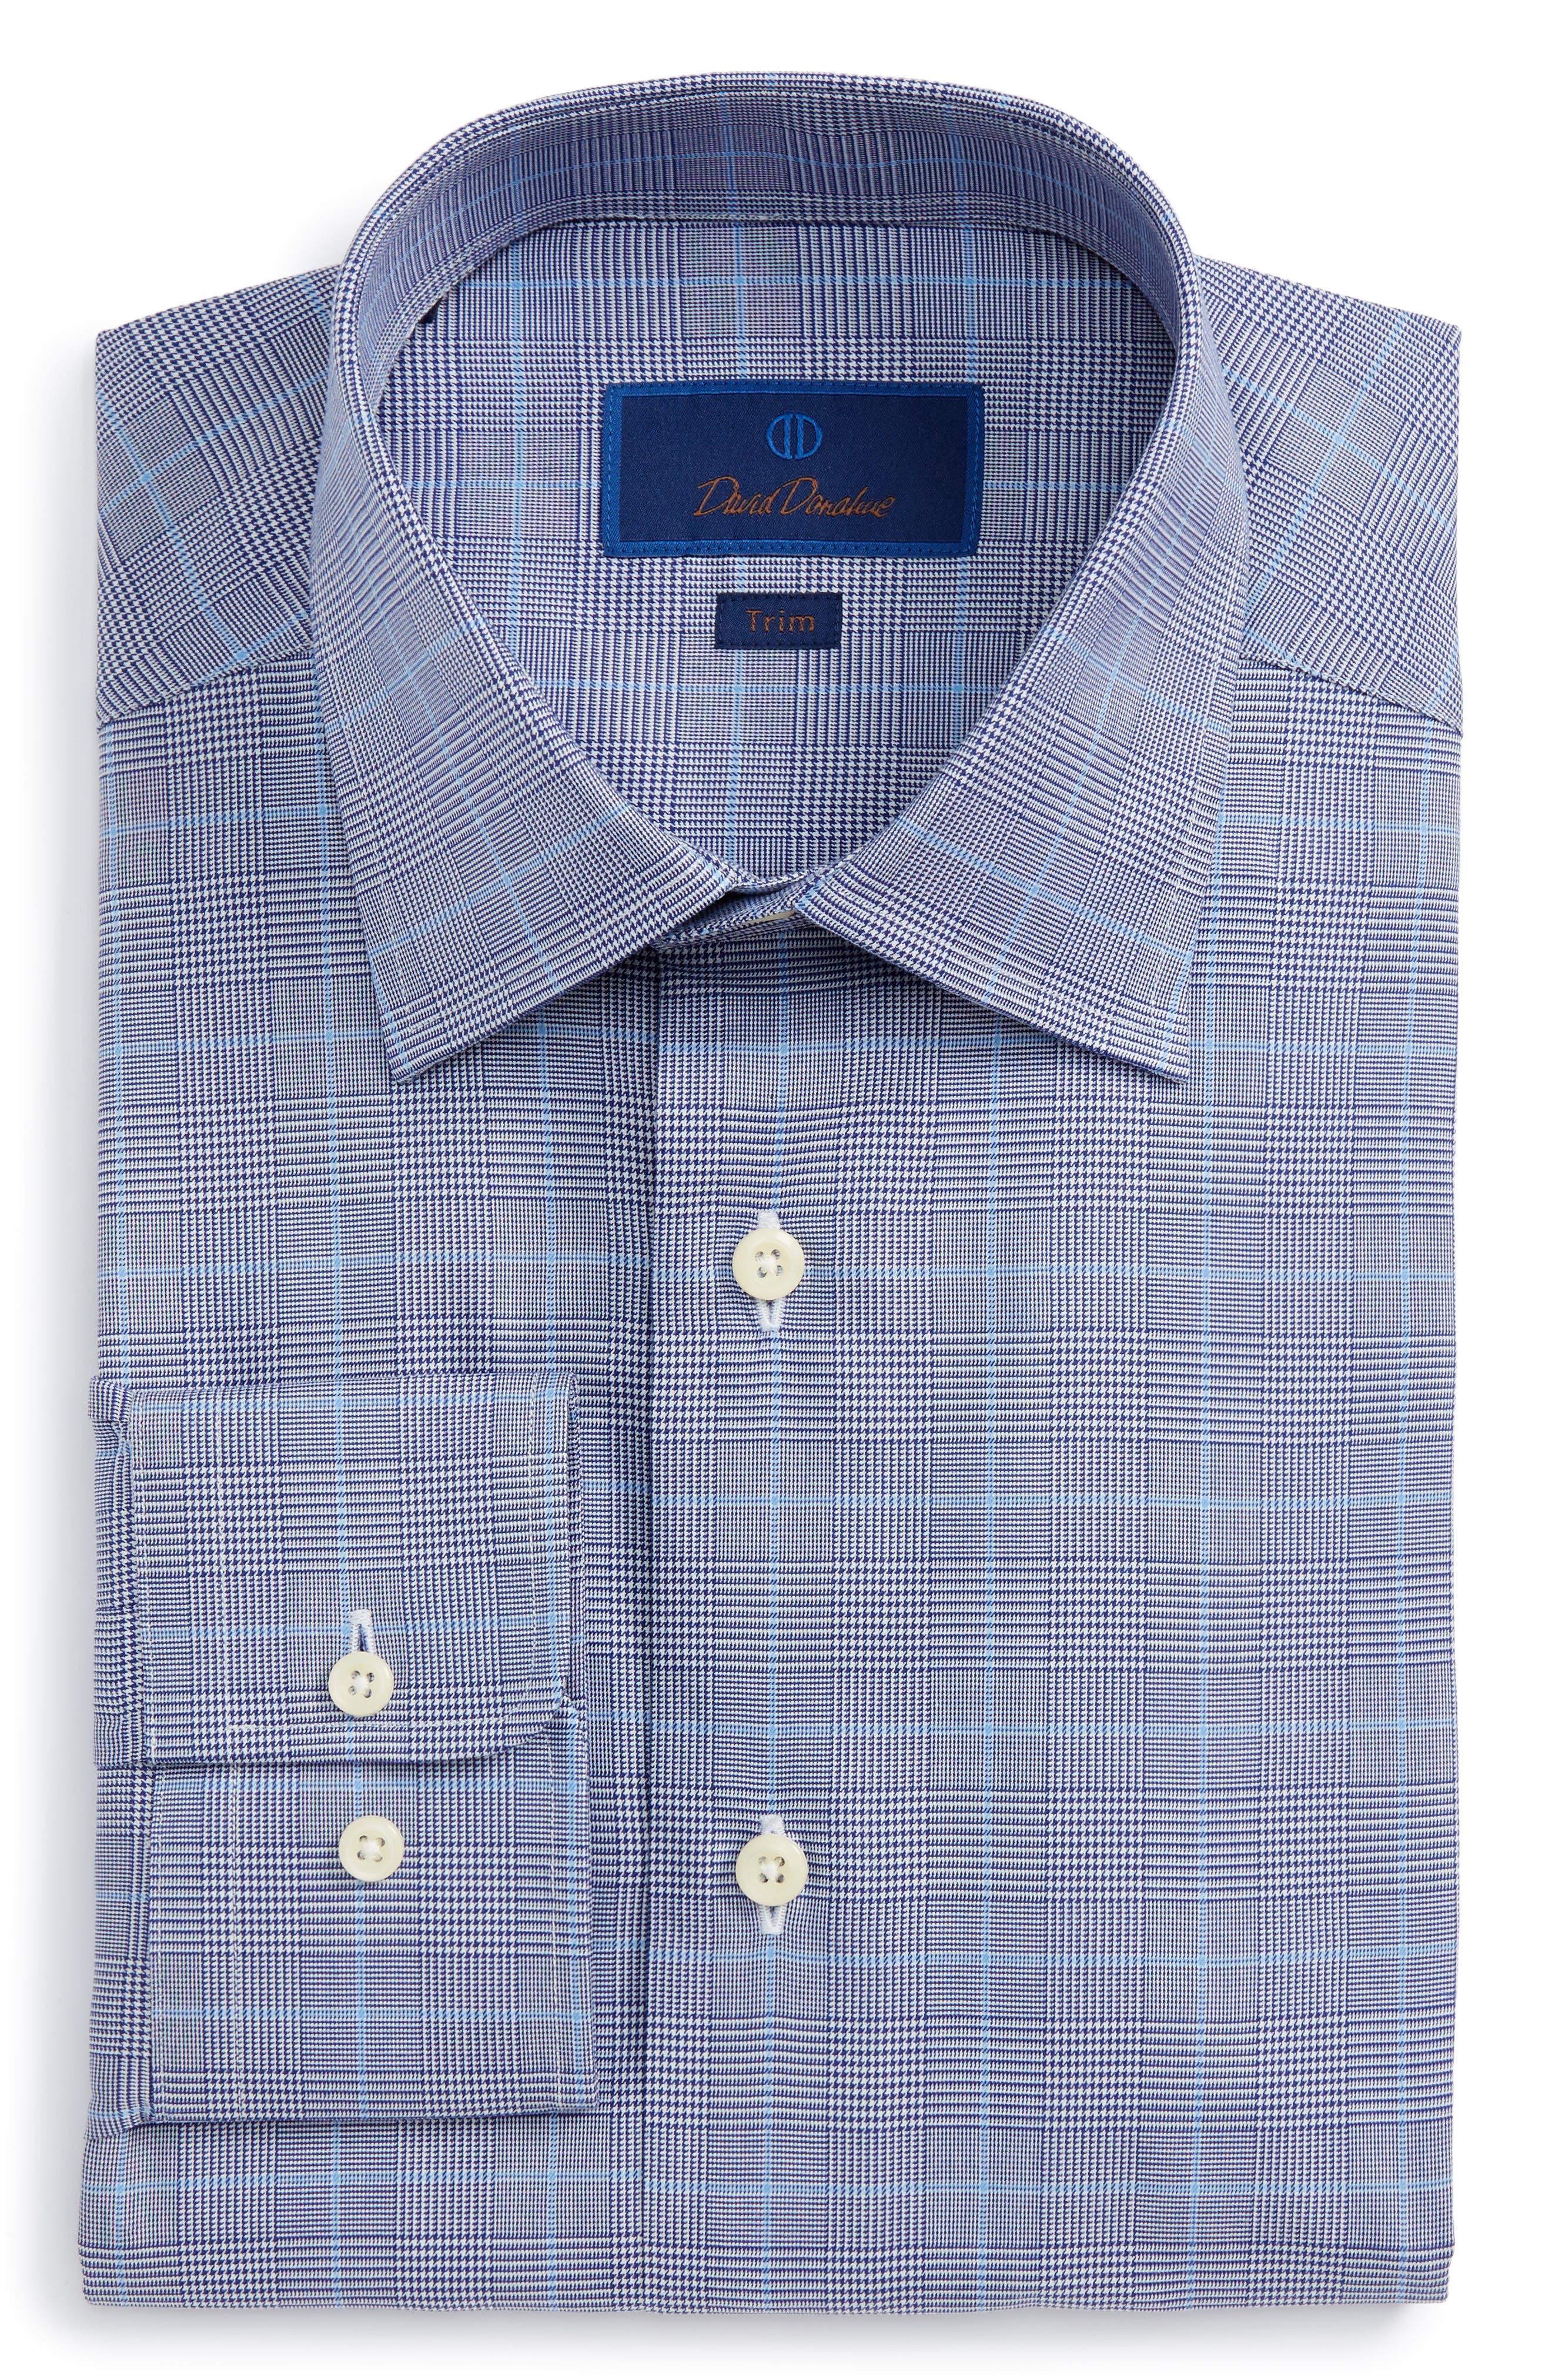 Alternate Image 1 Selected - David Donahue Trim Fit Plaid Dress Shirt